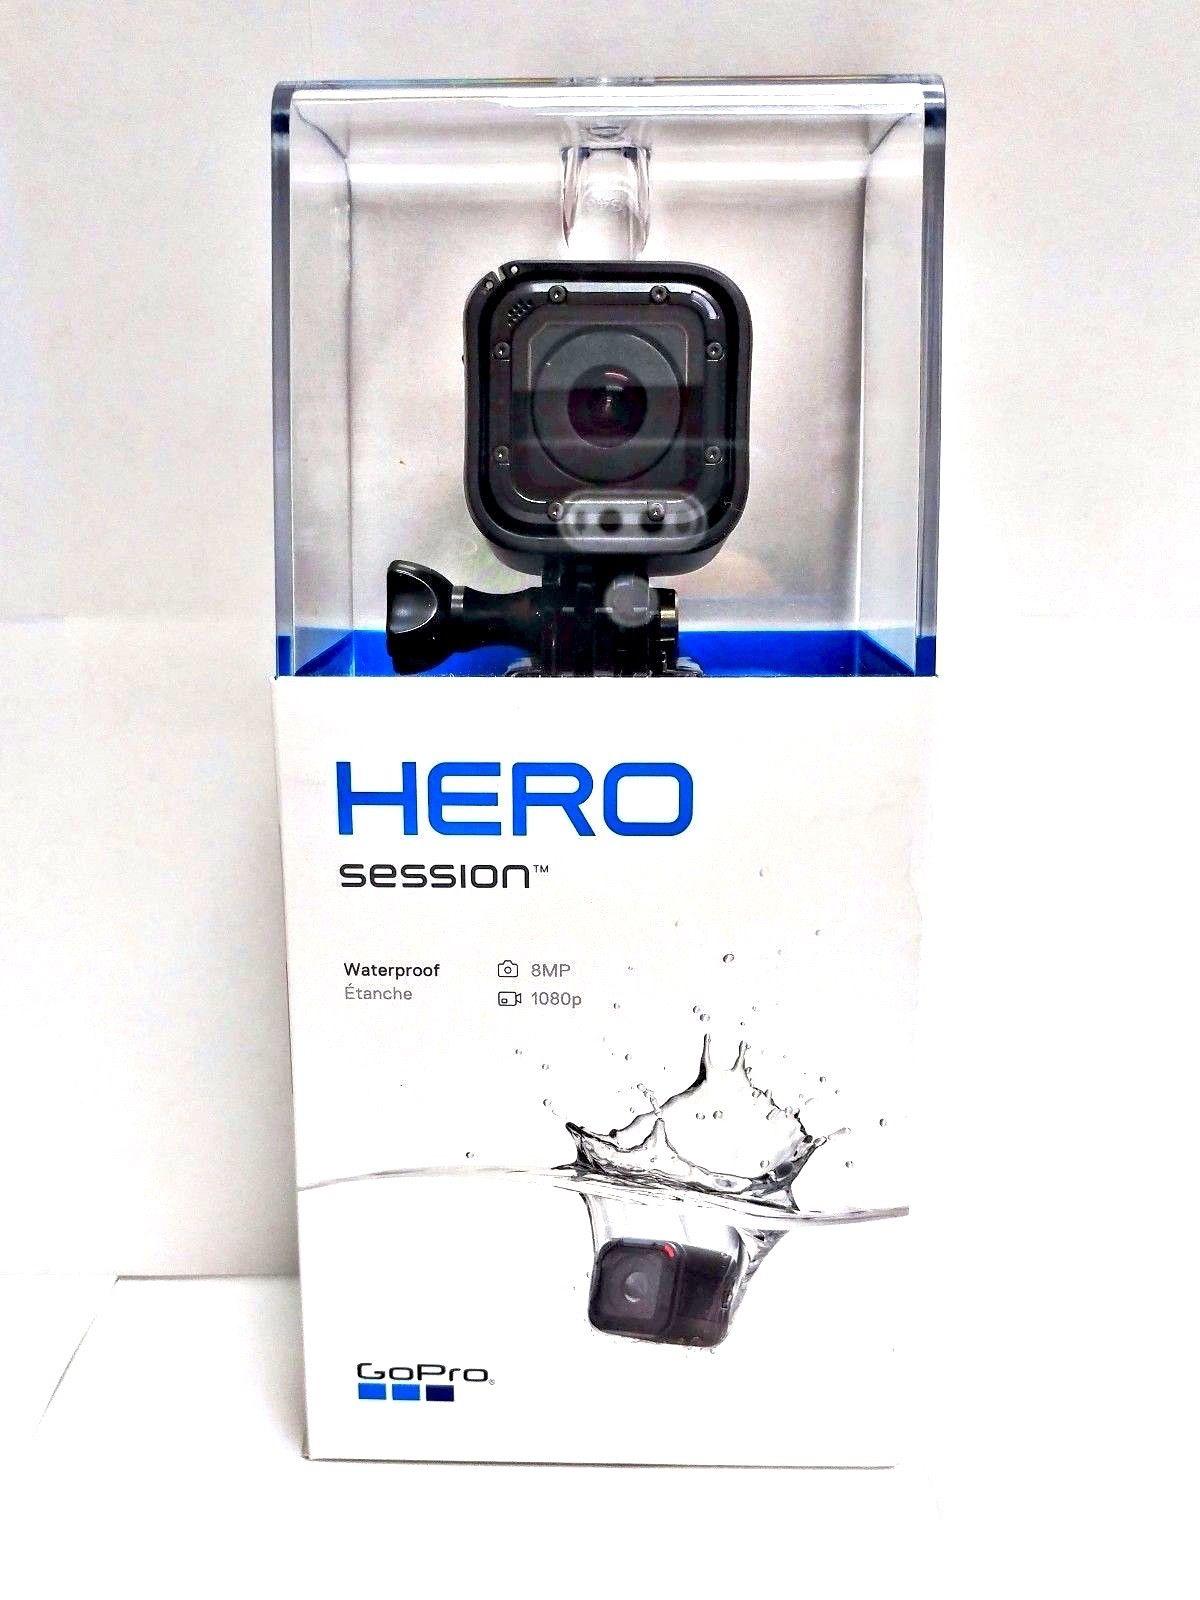 GOPRO HERO Session HD Movement Digicam WiFi Video 1080p Digital camera NEW + WARRANTY